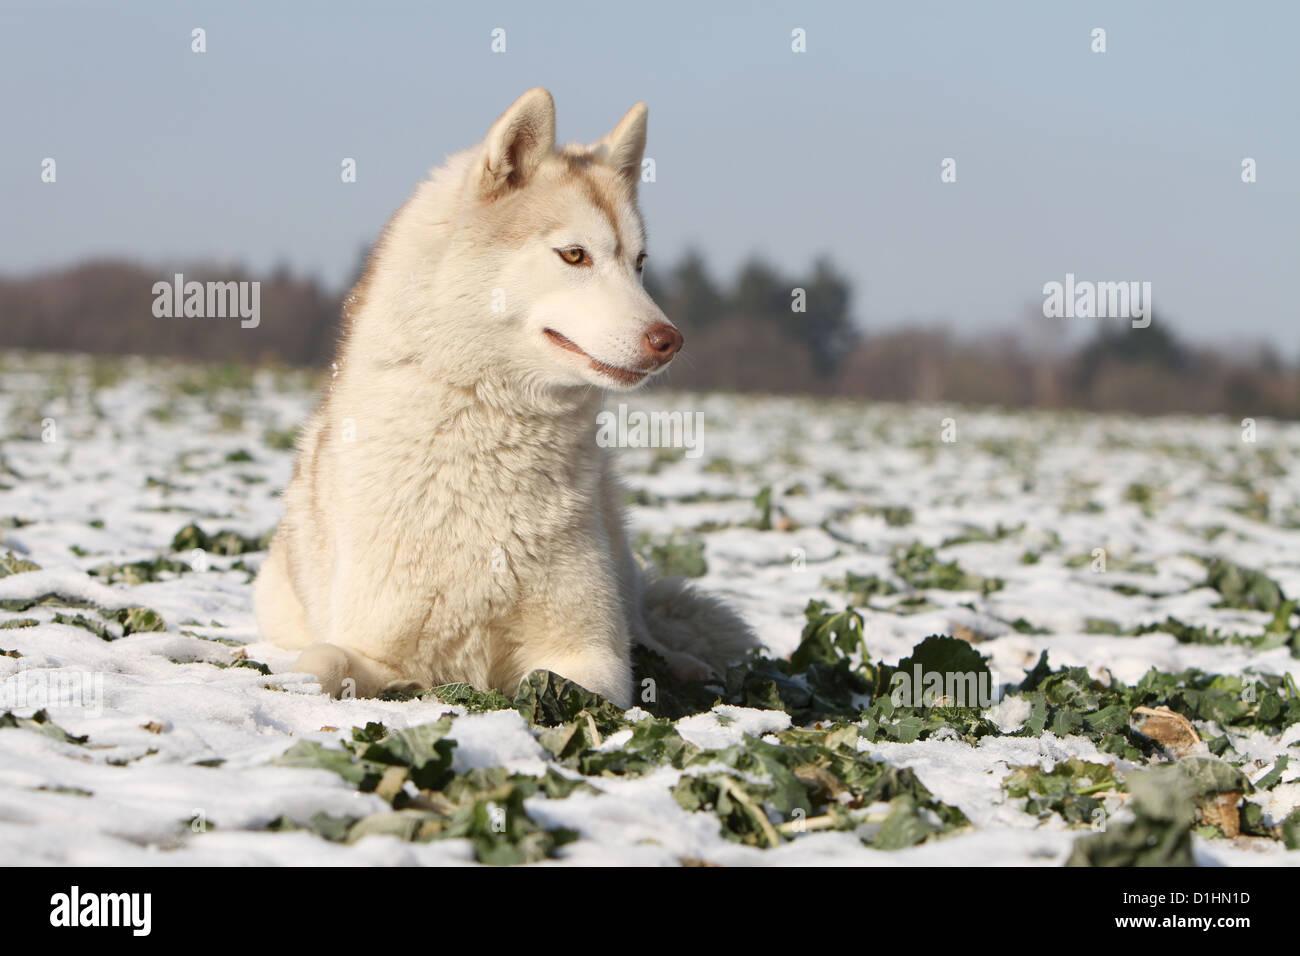 Dog Siberian Husky Adult Brown And White Lying Down On Snow Stock